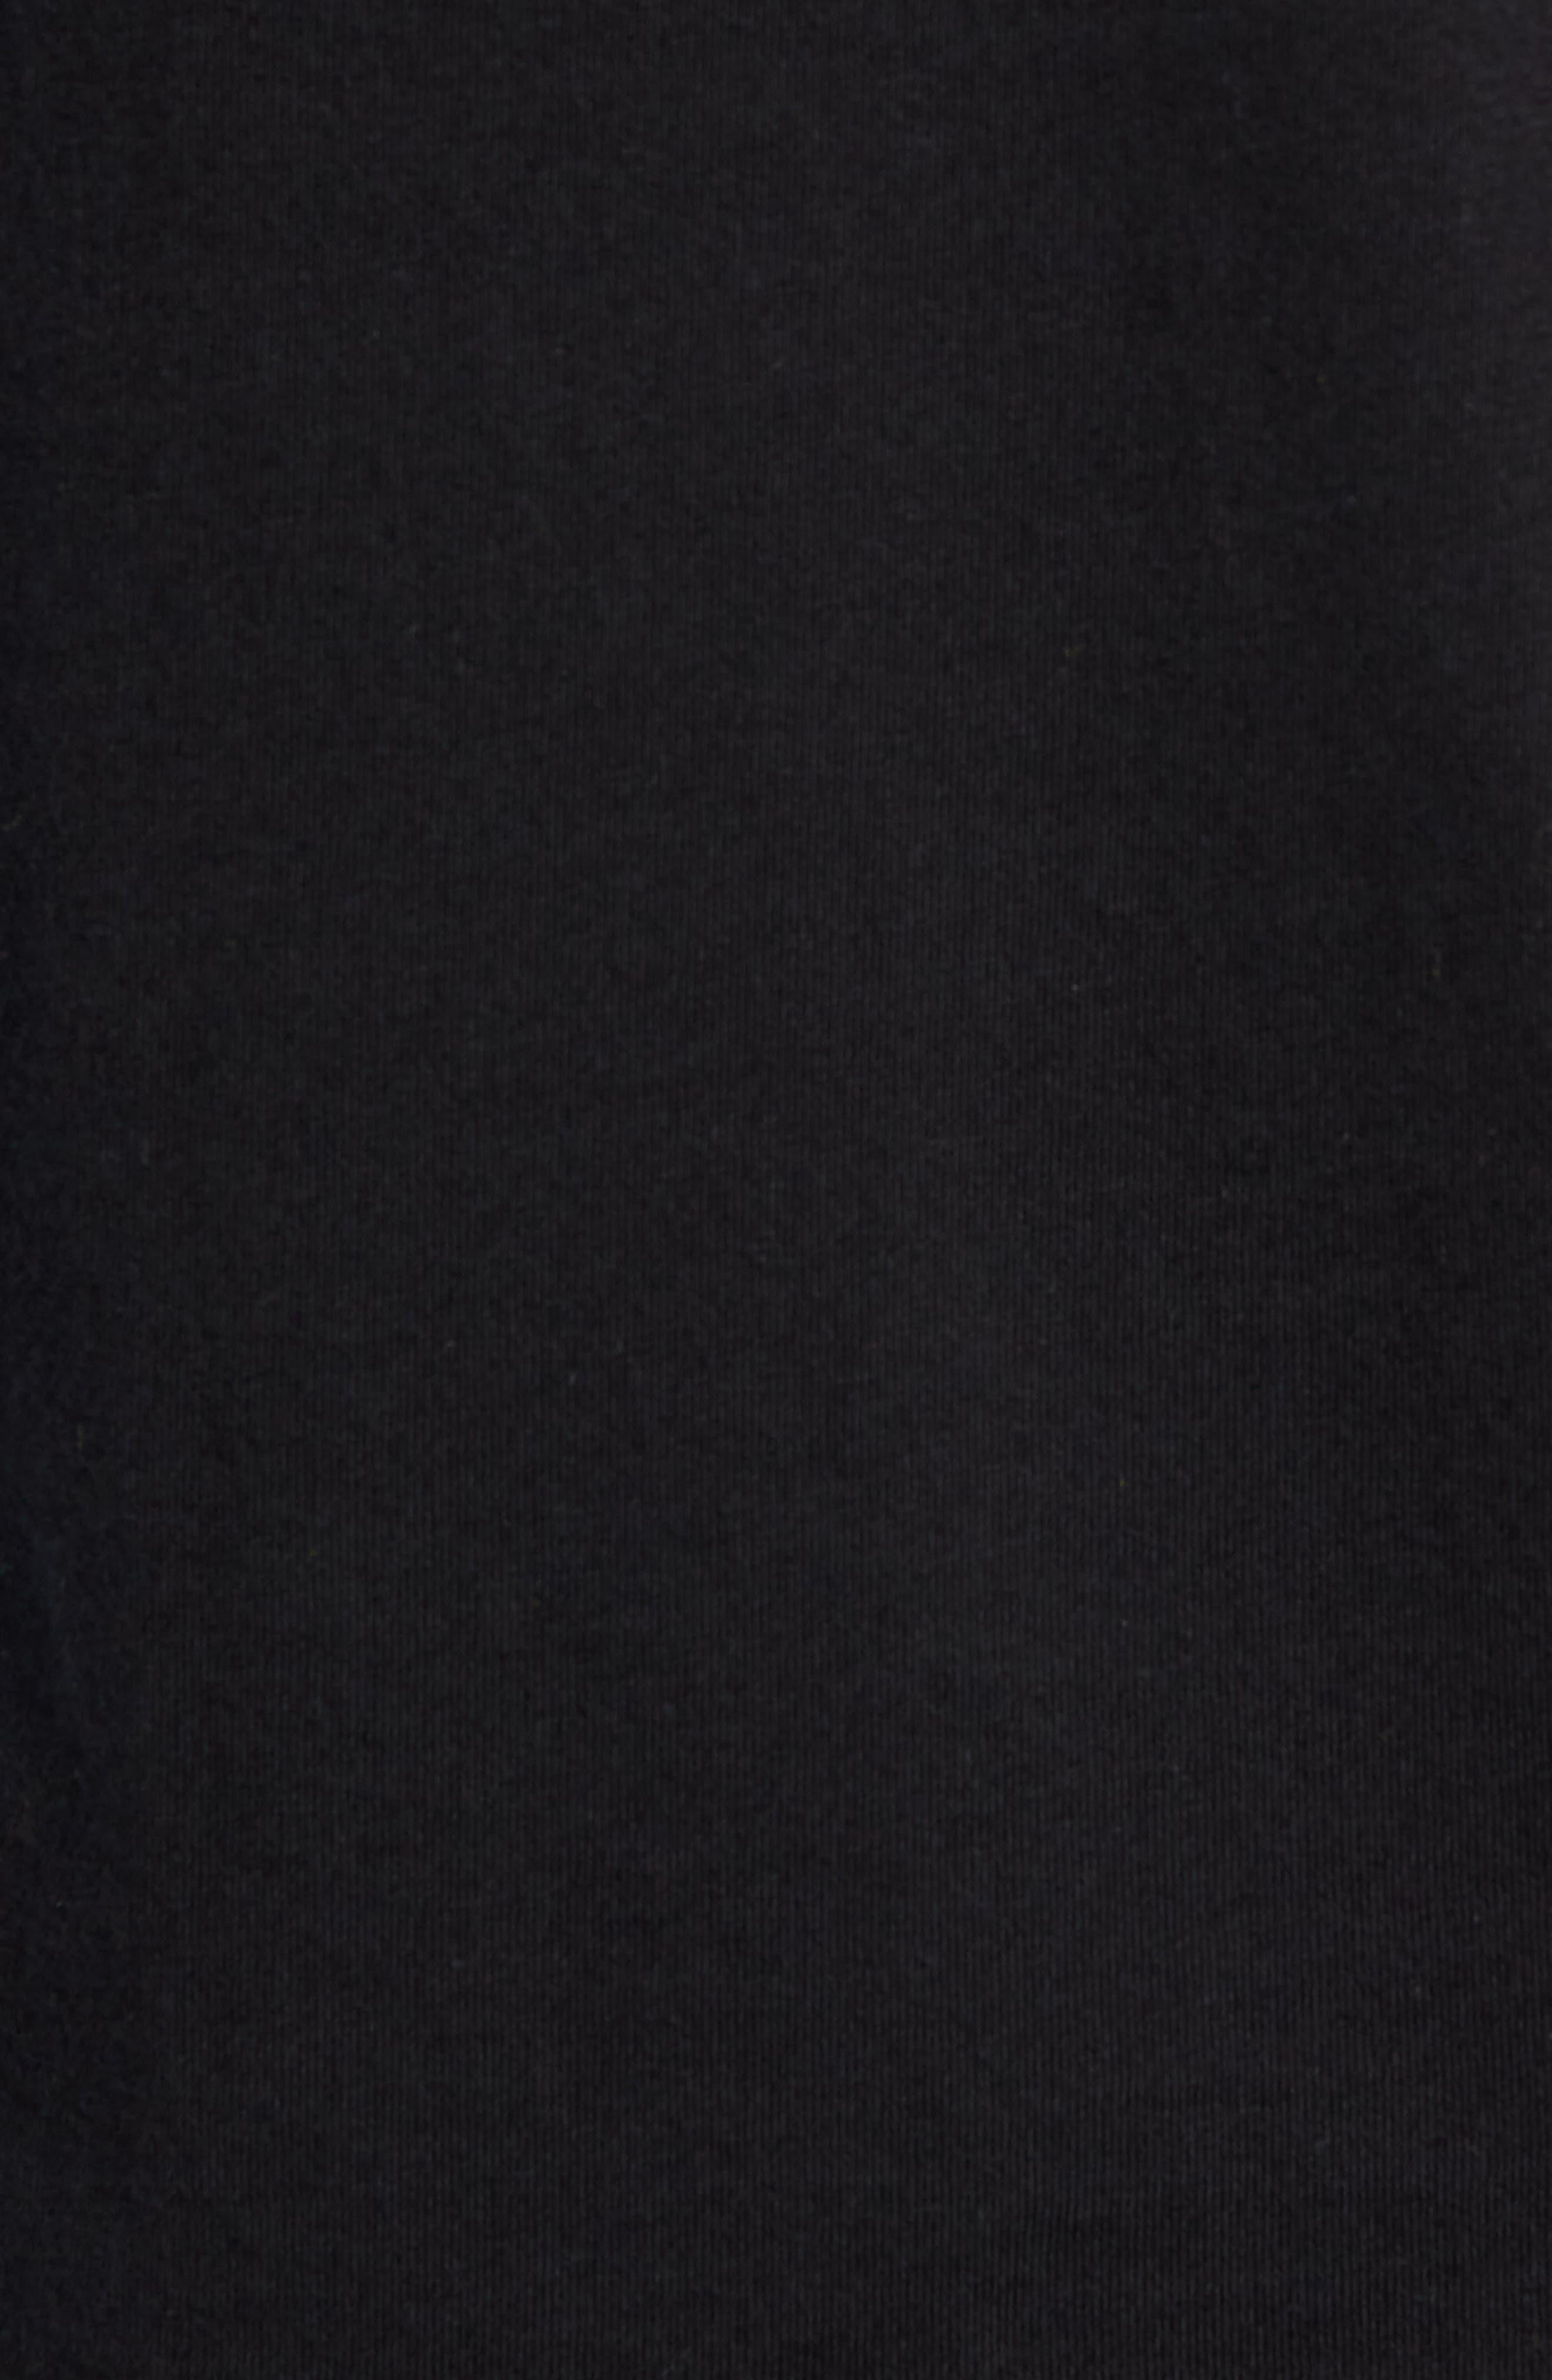 TOMMY JEANS,                             TJM Logo Graphic Long Sleeve T-Shirt,                             Alternate thumbnail 5, color,                             001